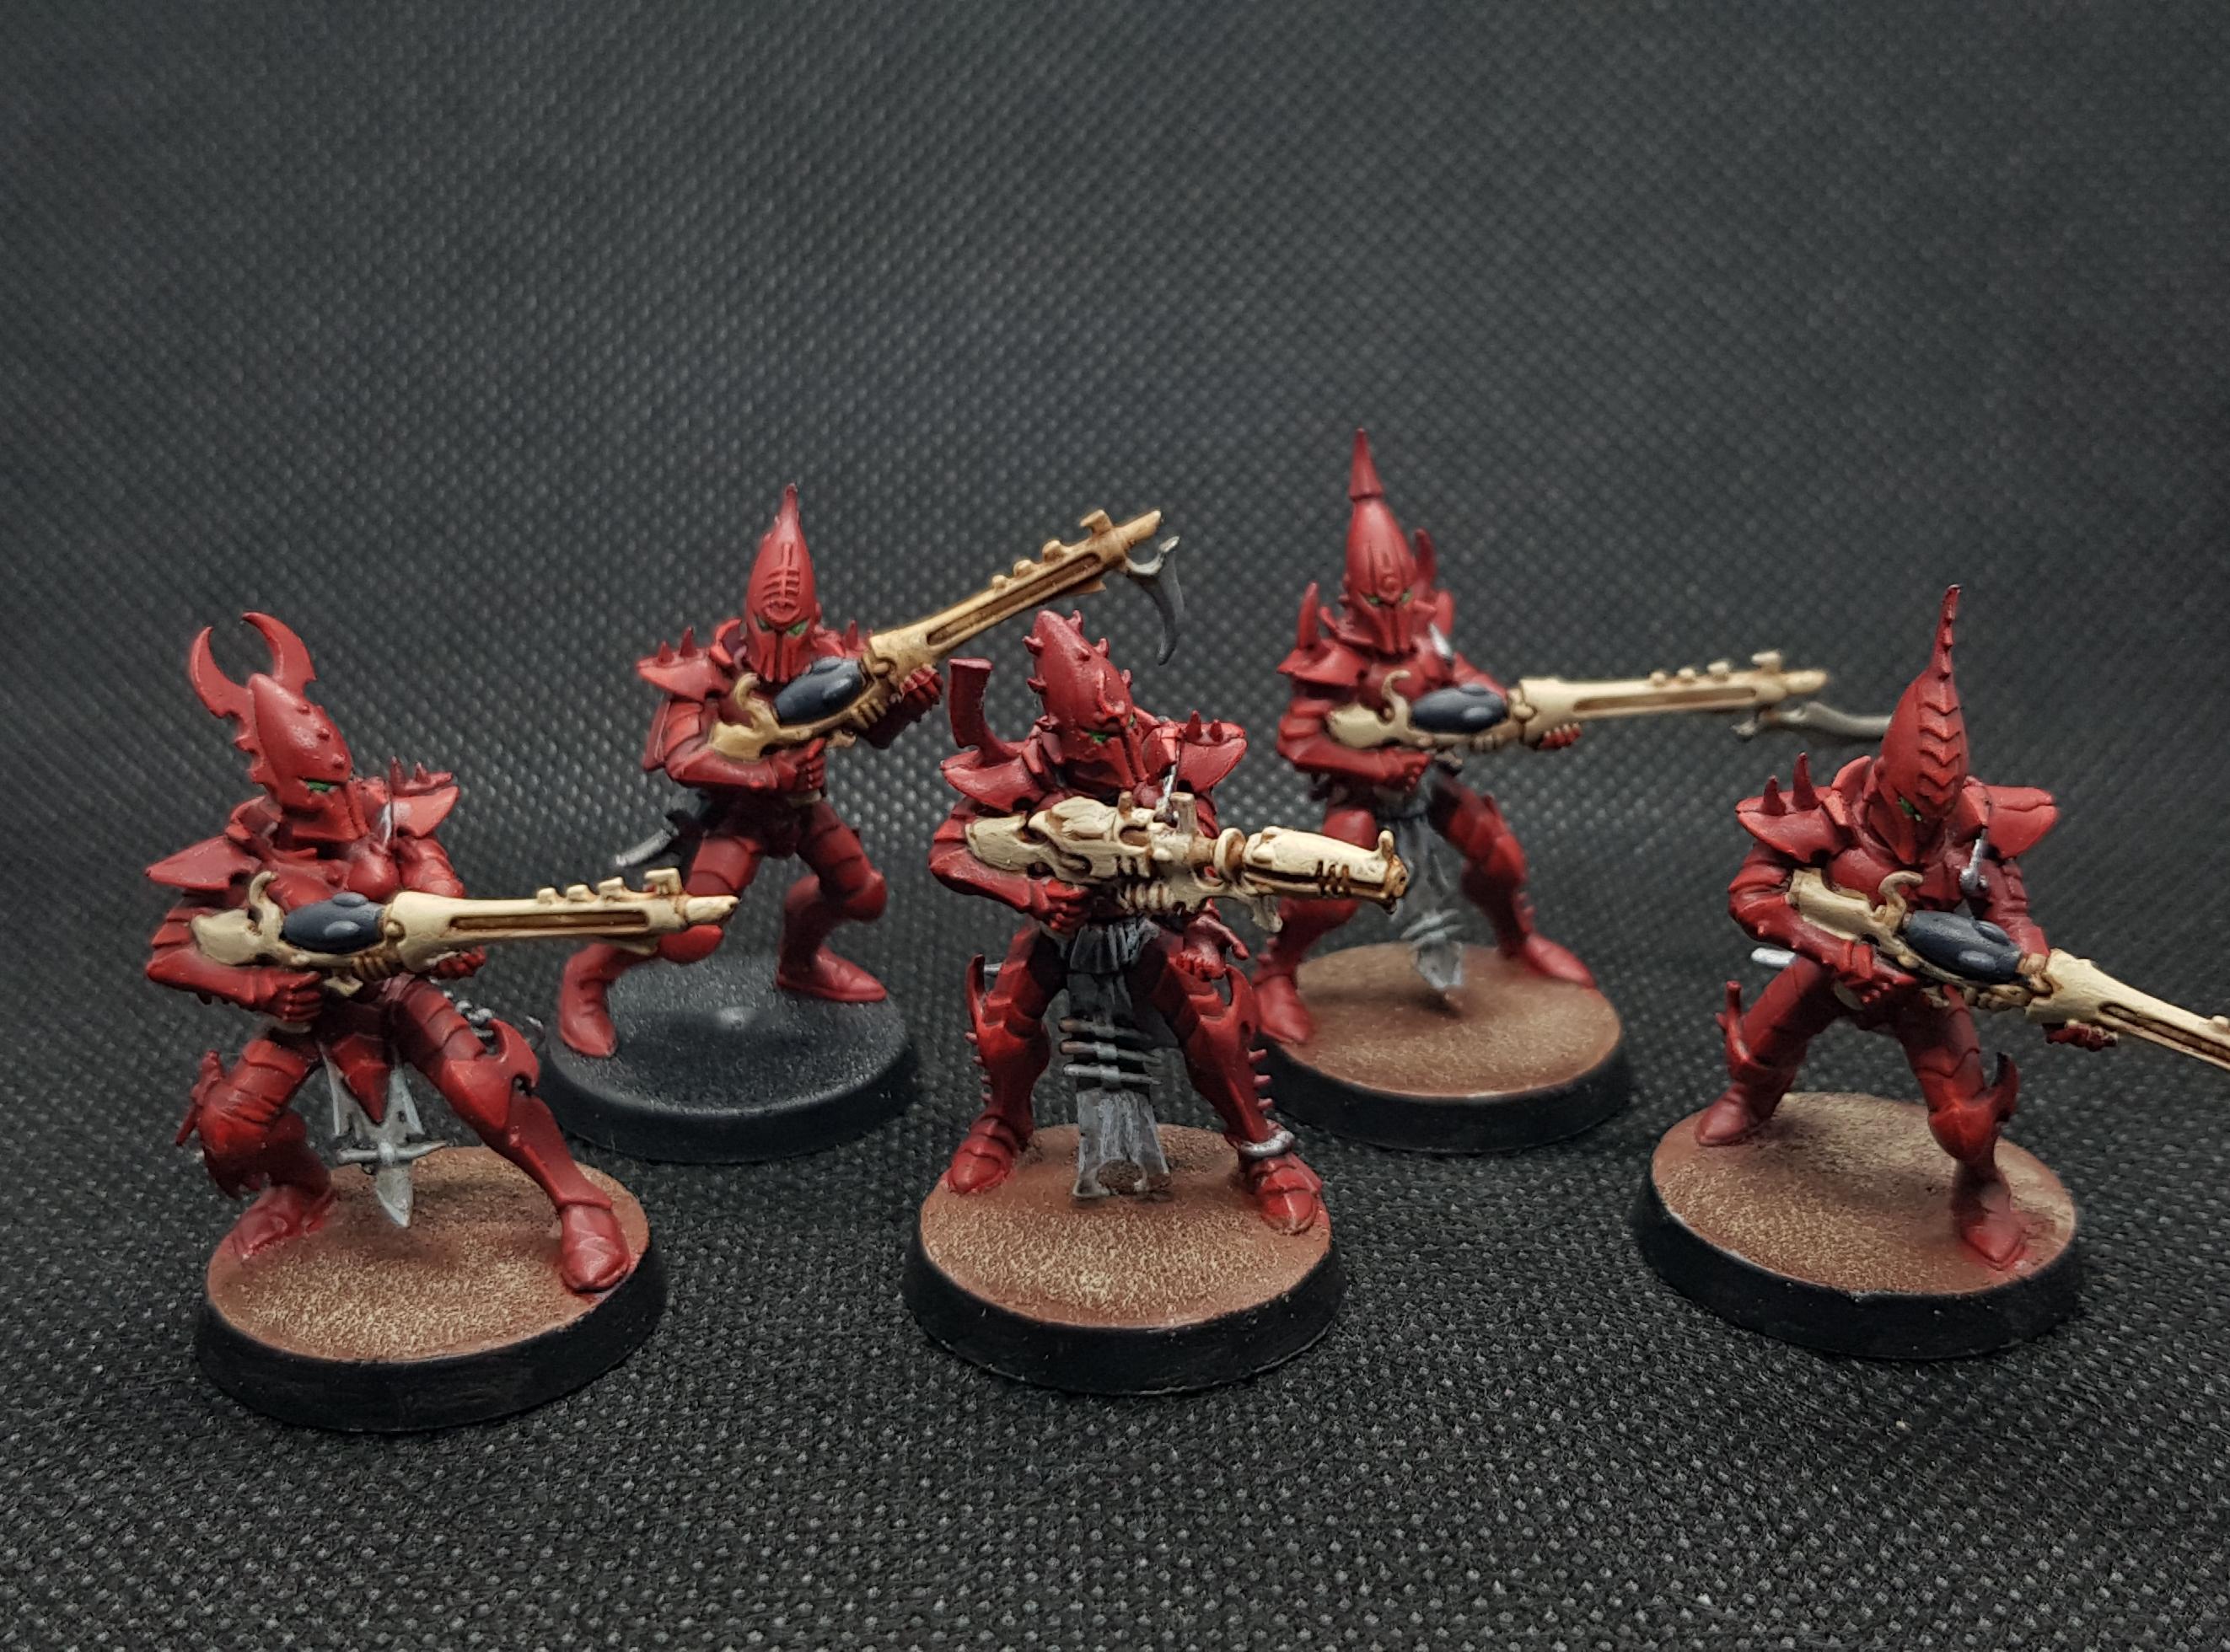 Aeldari, Dark Eldar, Drukhari, Eldar, Kabal, Warriors, Wych Cult